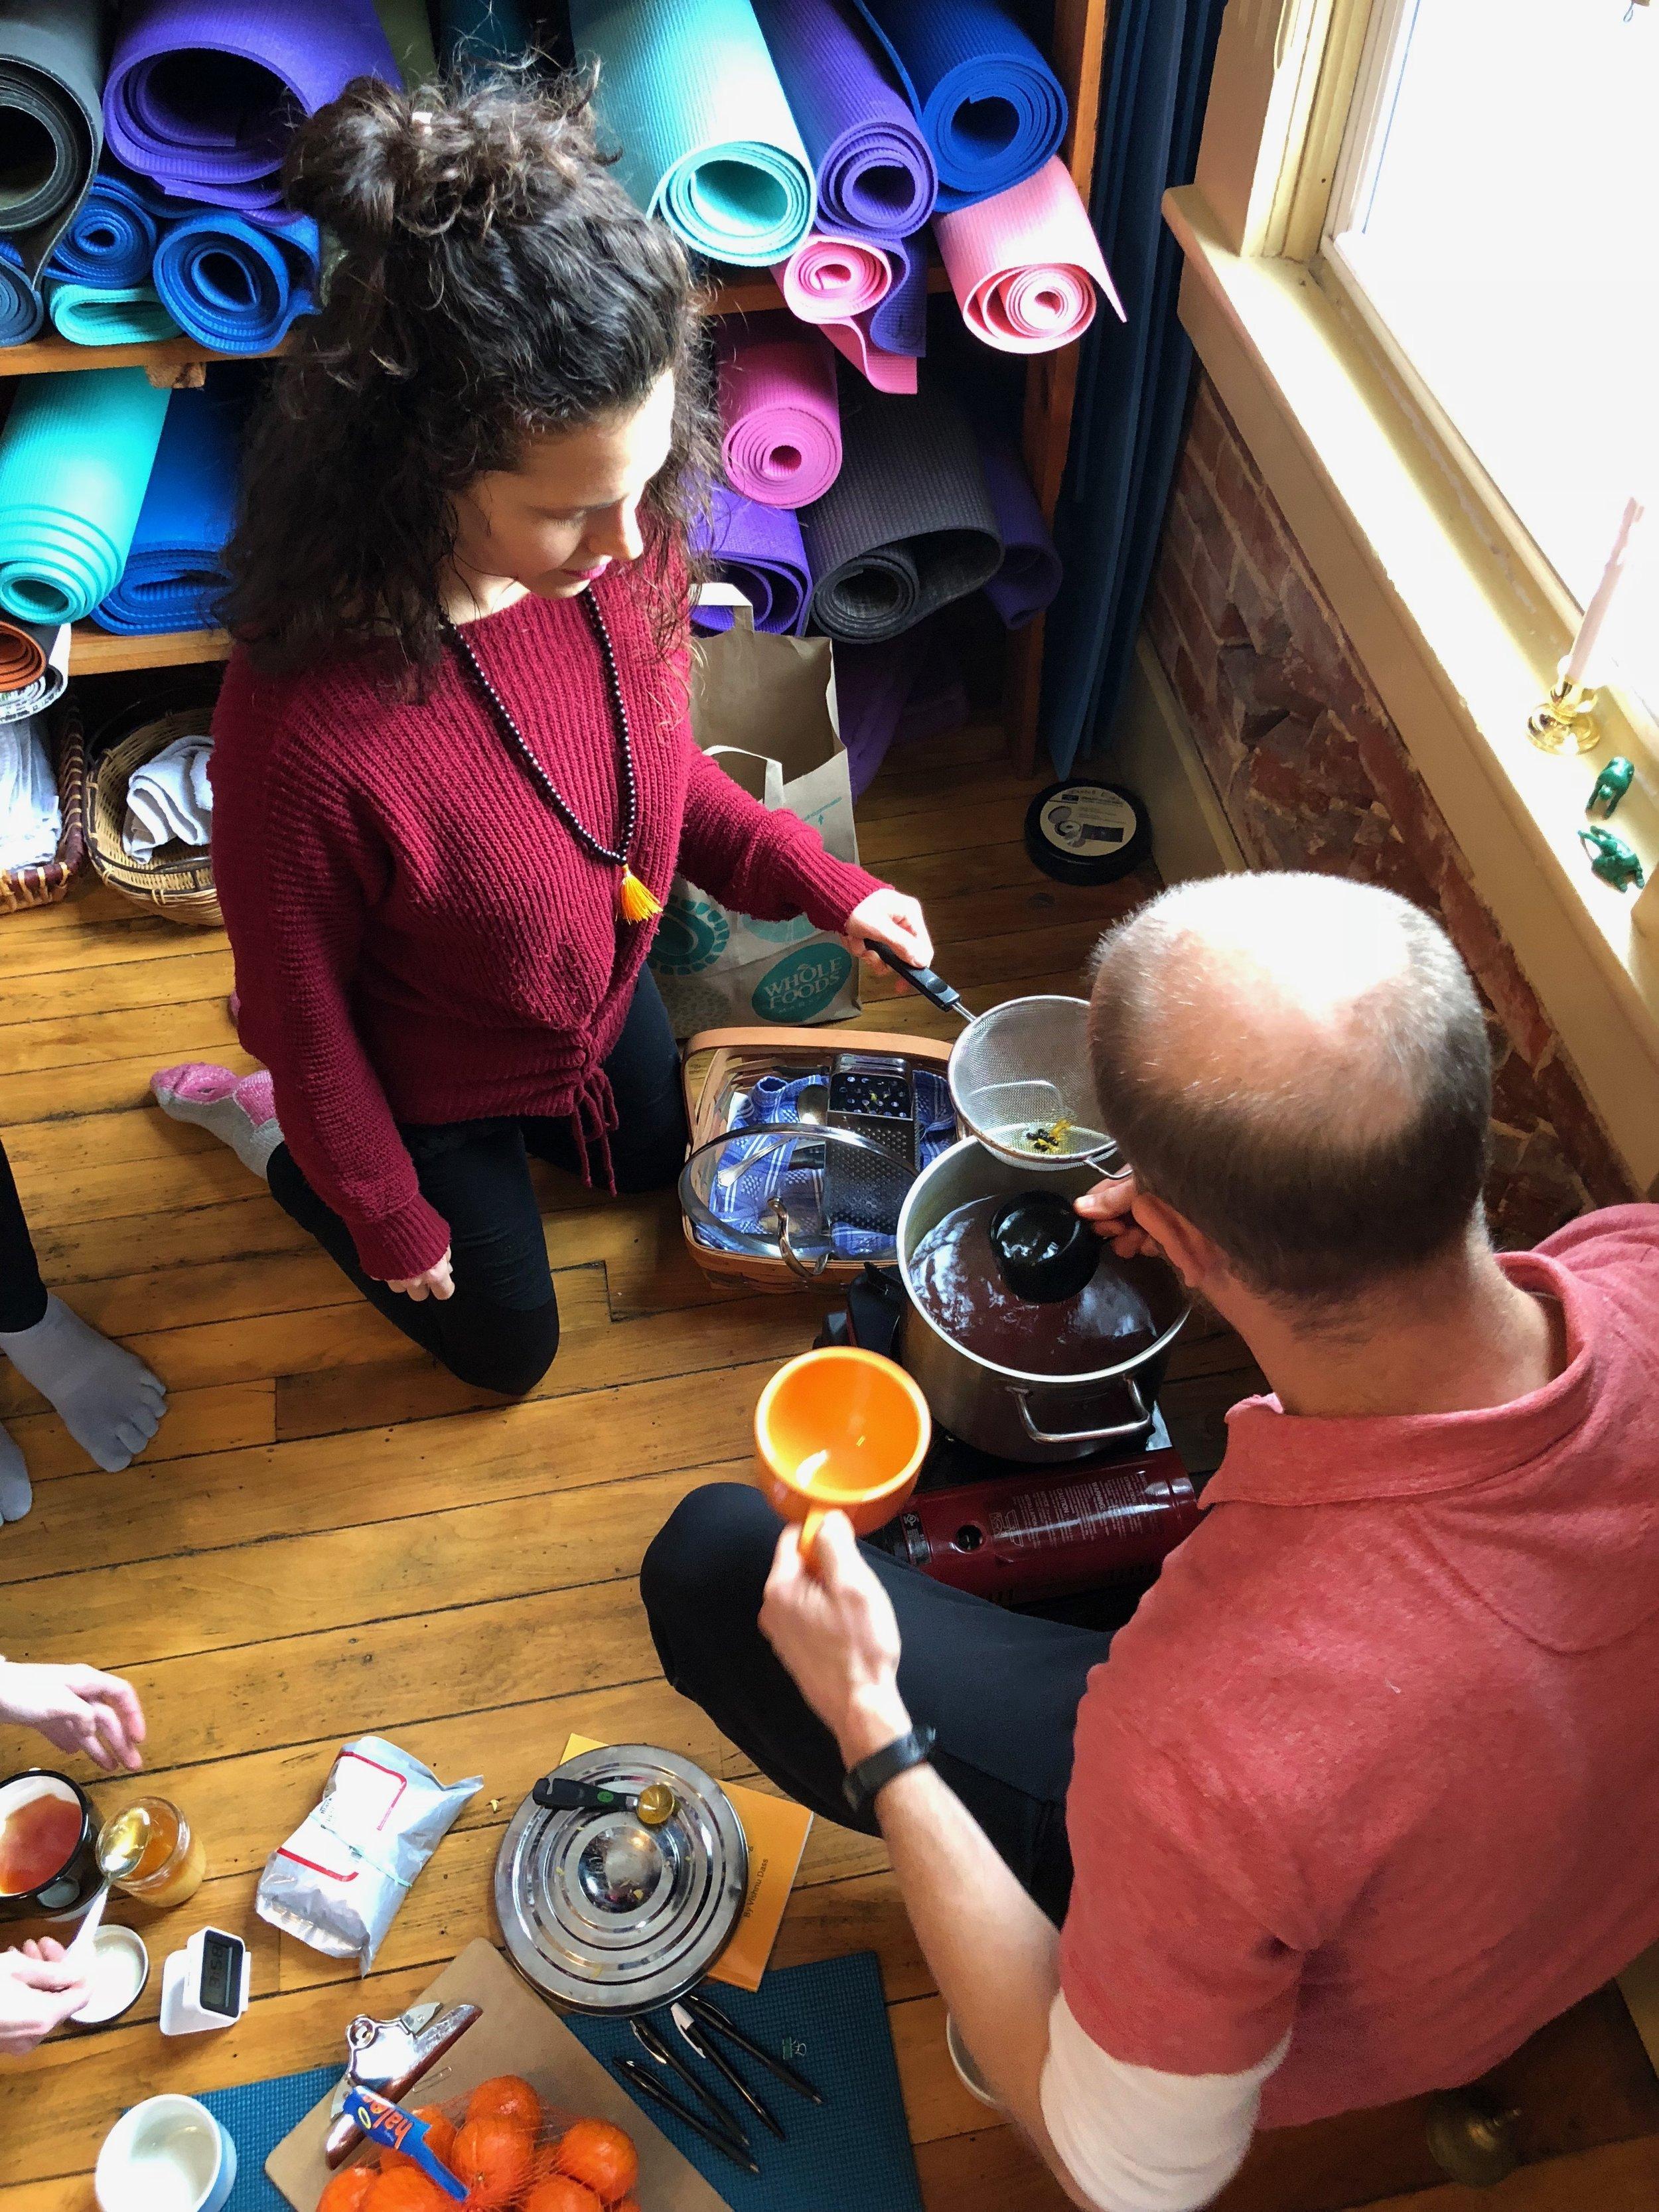 Making agni tea_Ayurveda workshop_Firehorse Feb 2018.JPG